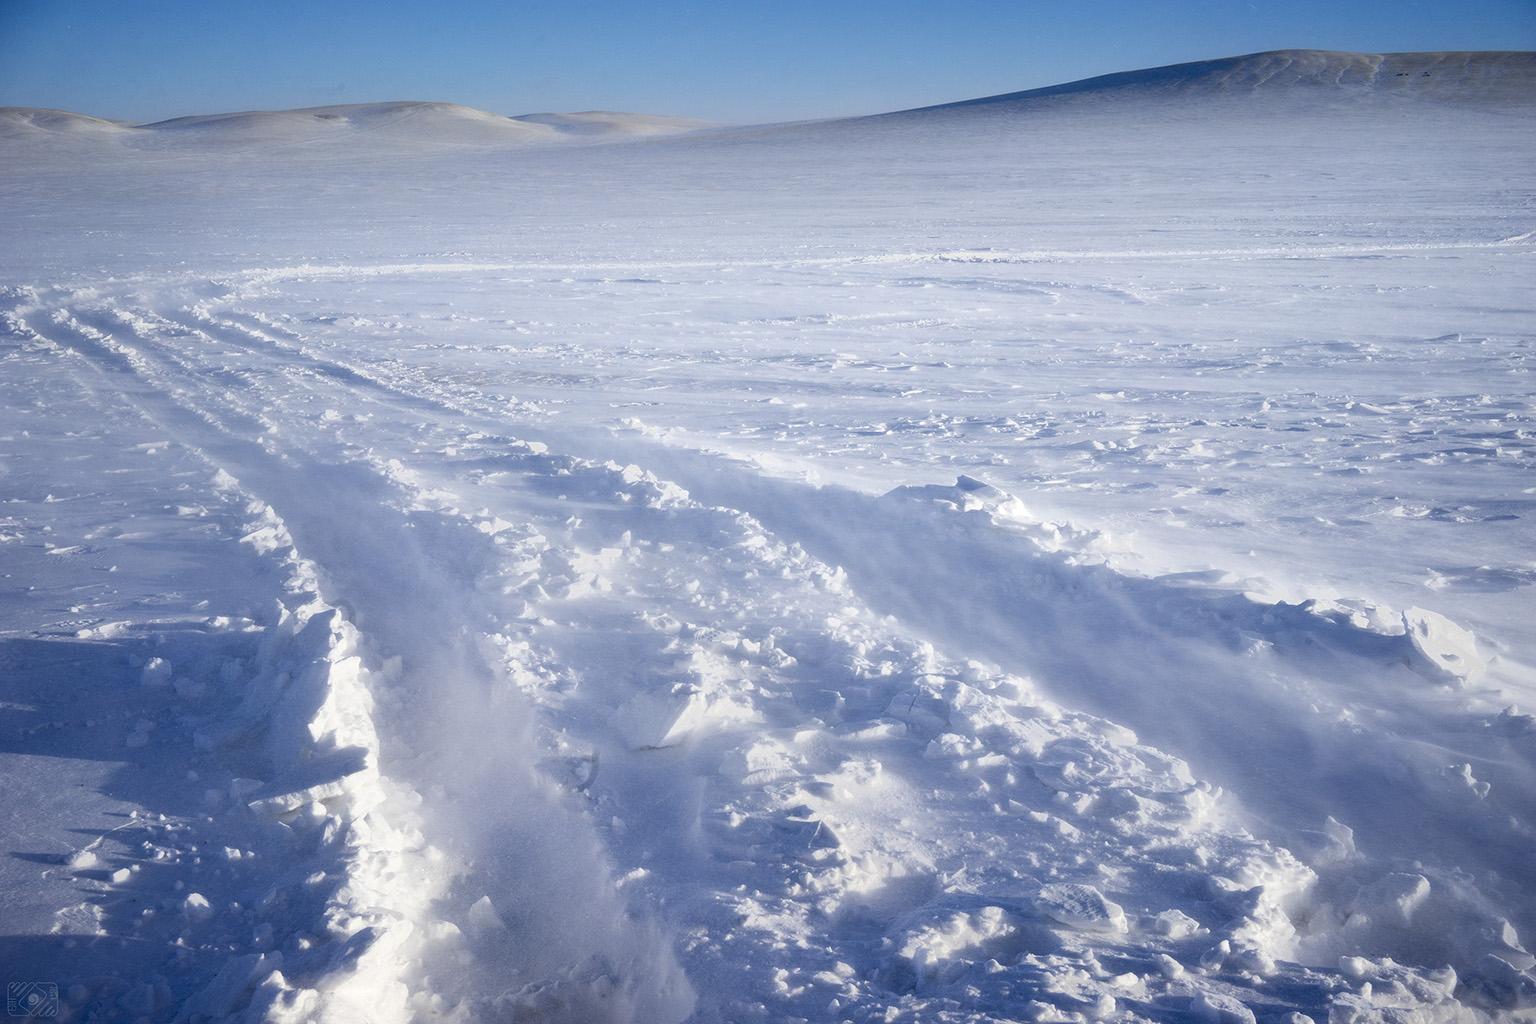 镜缘WY001作品:冰雪之路